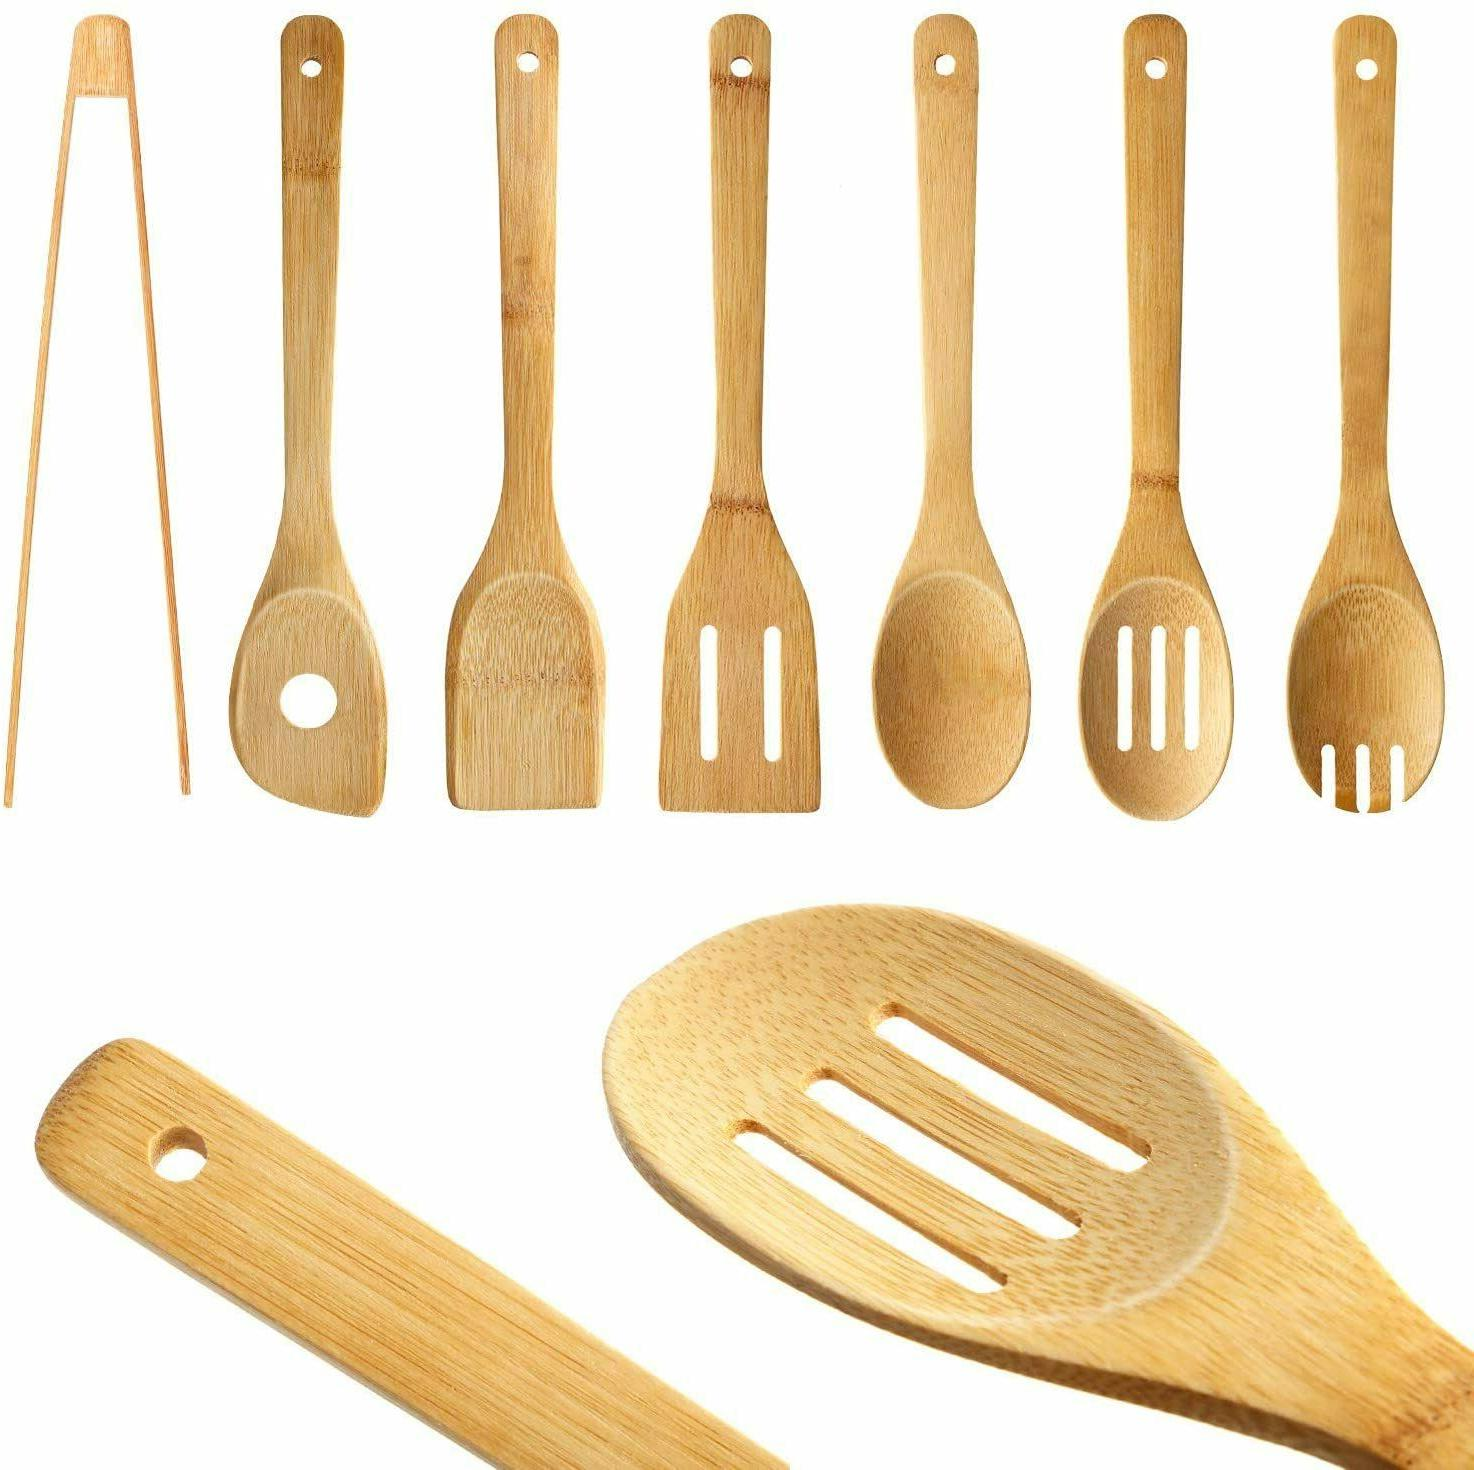 7 PCS Bamboo Kitchen Cooking Set Spatula Spoon Home Tools